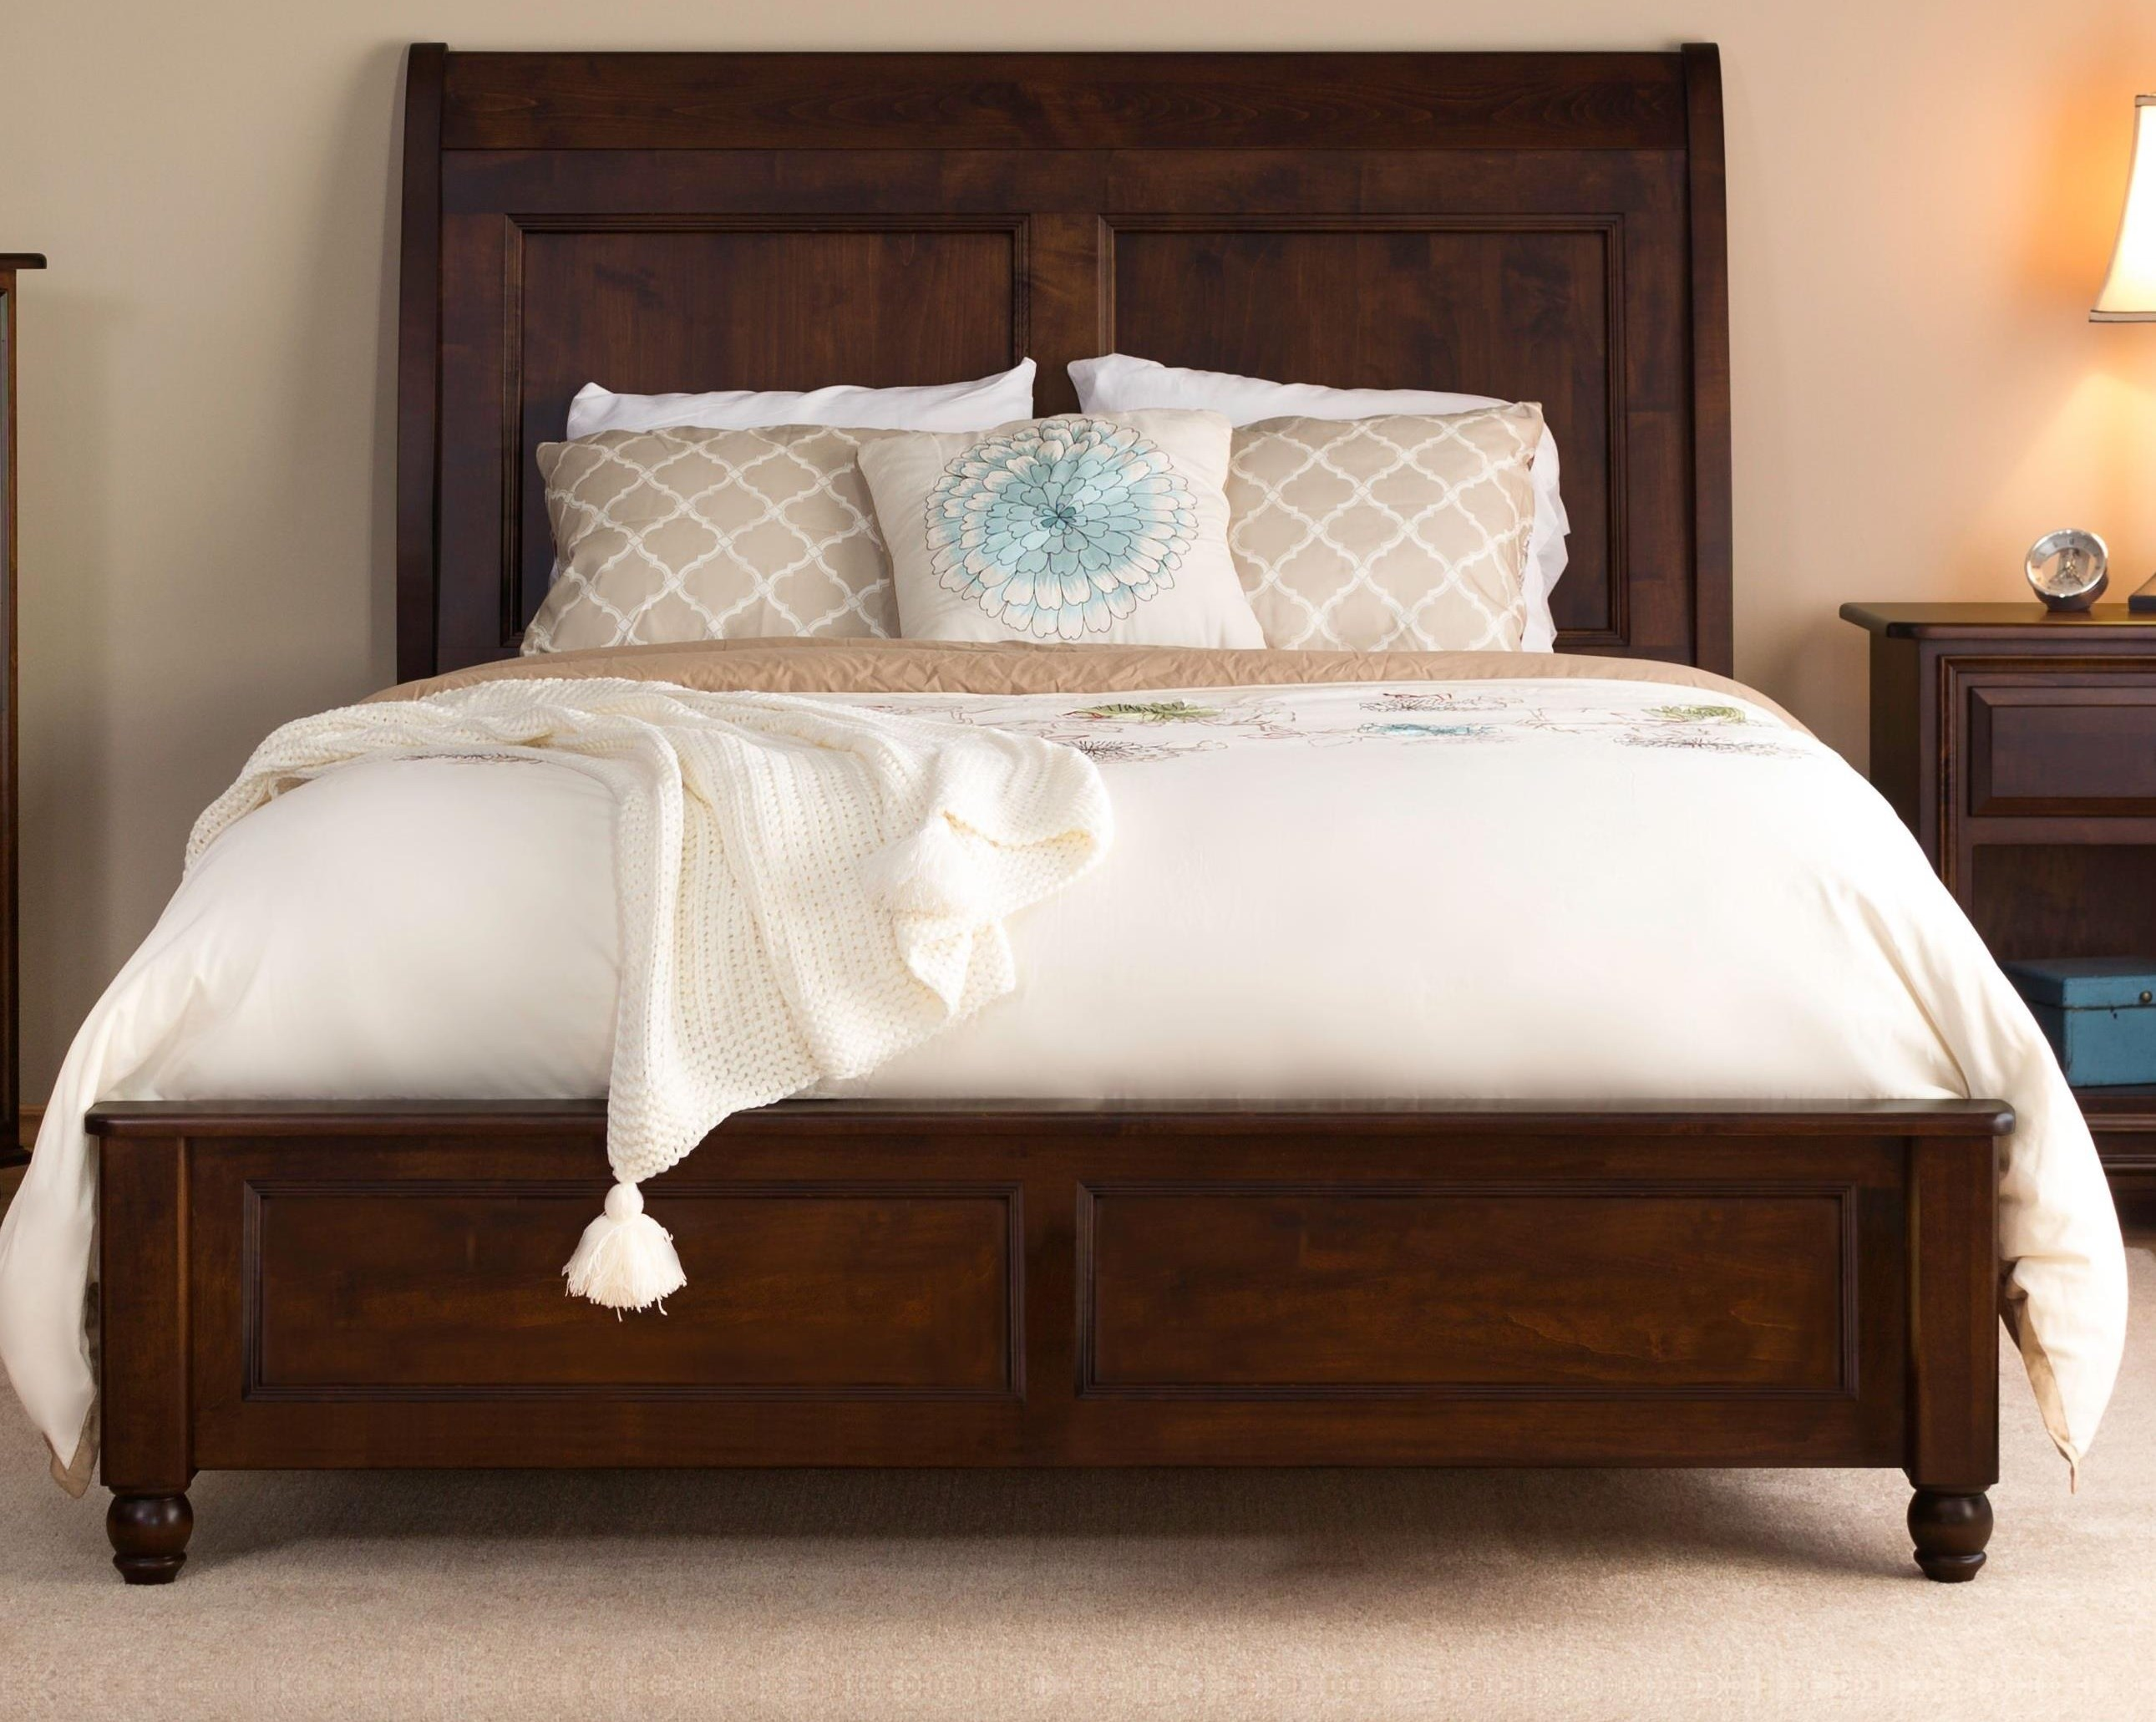 Charlton Charlton King Bed at Morris Home